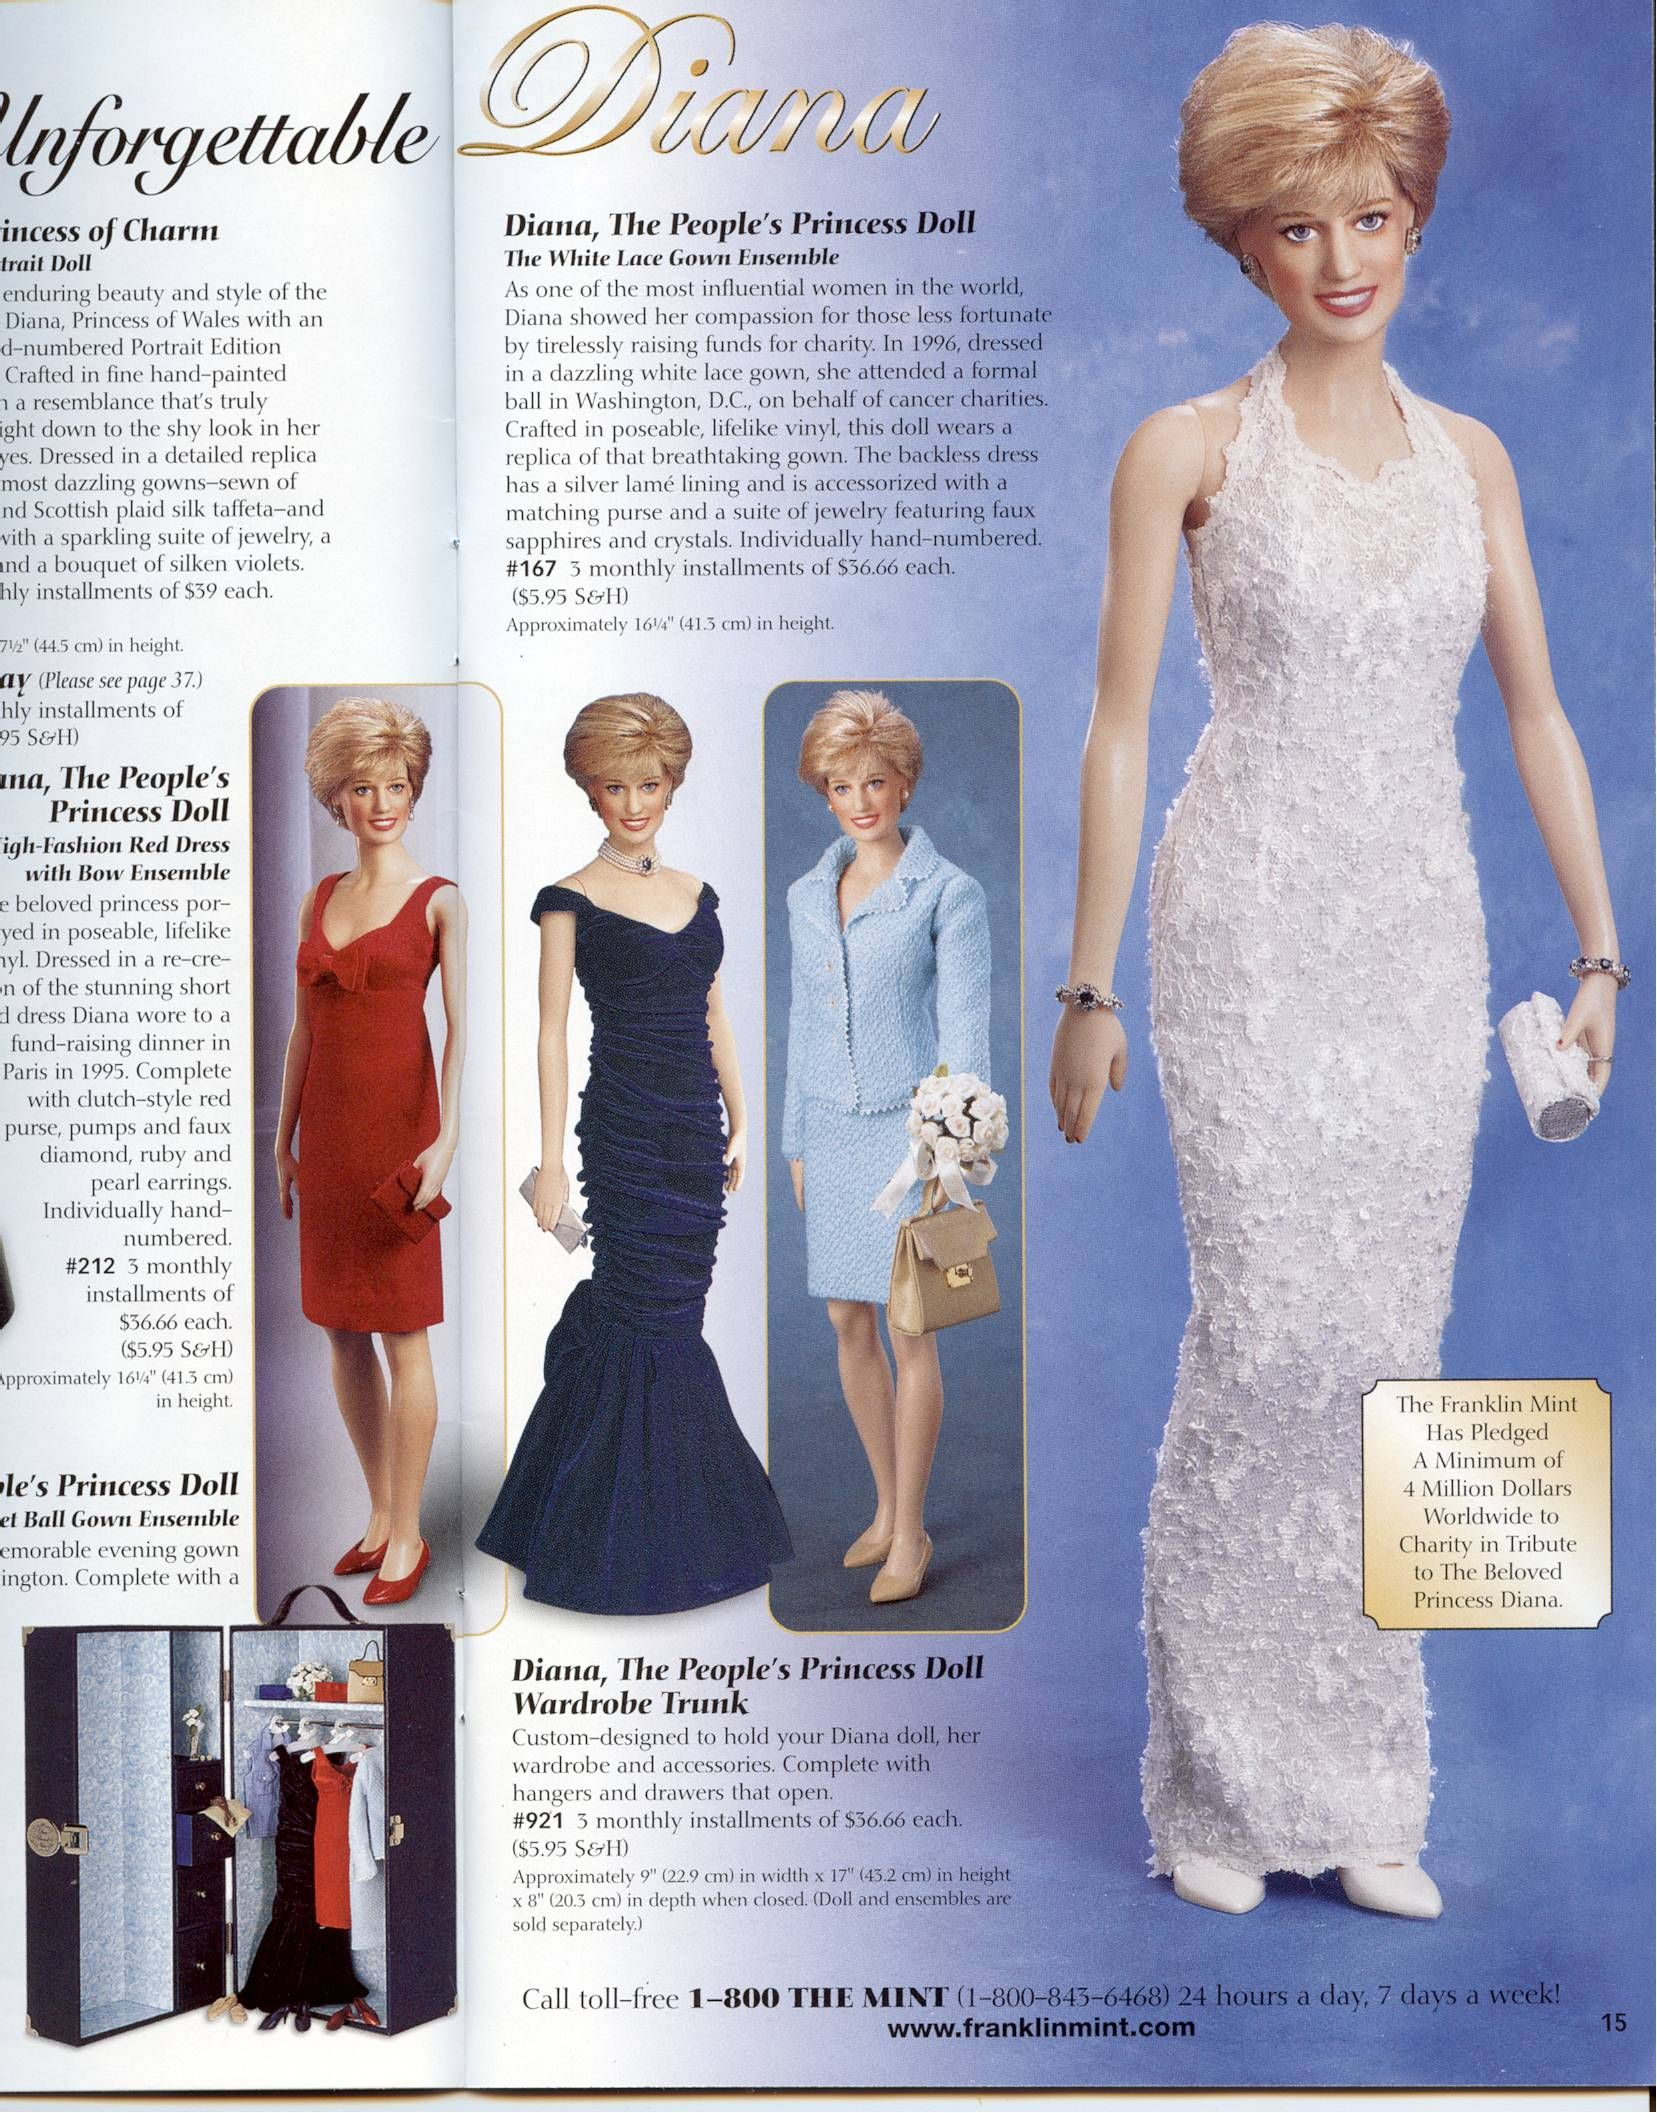 Franklin Mint Princess Diana Doll Wardrobe Trunk /& 5 Outfits